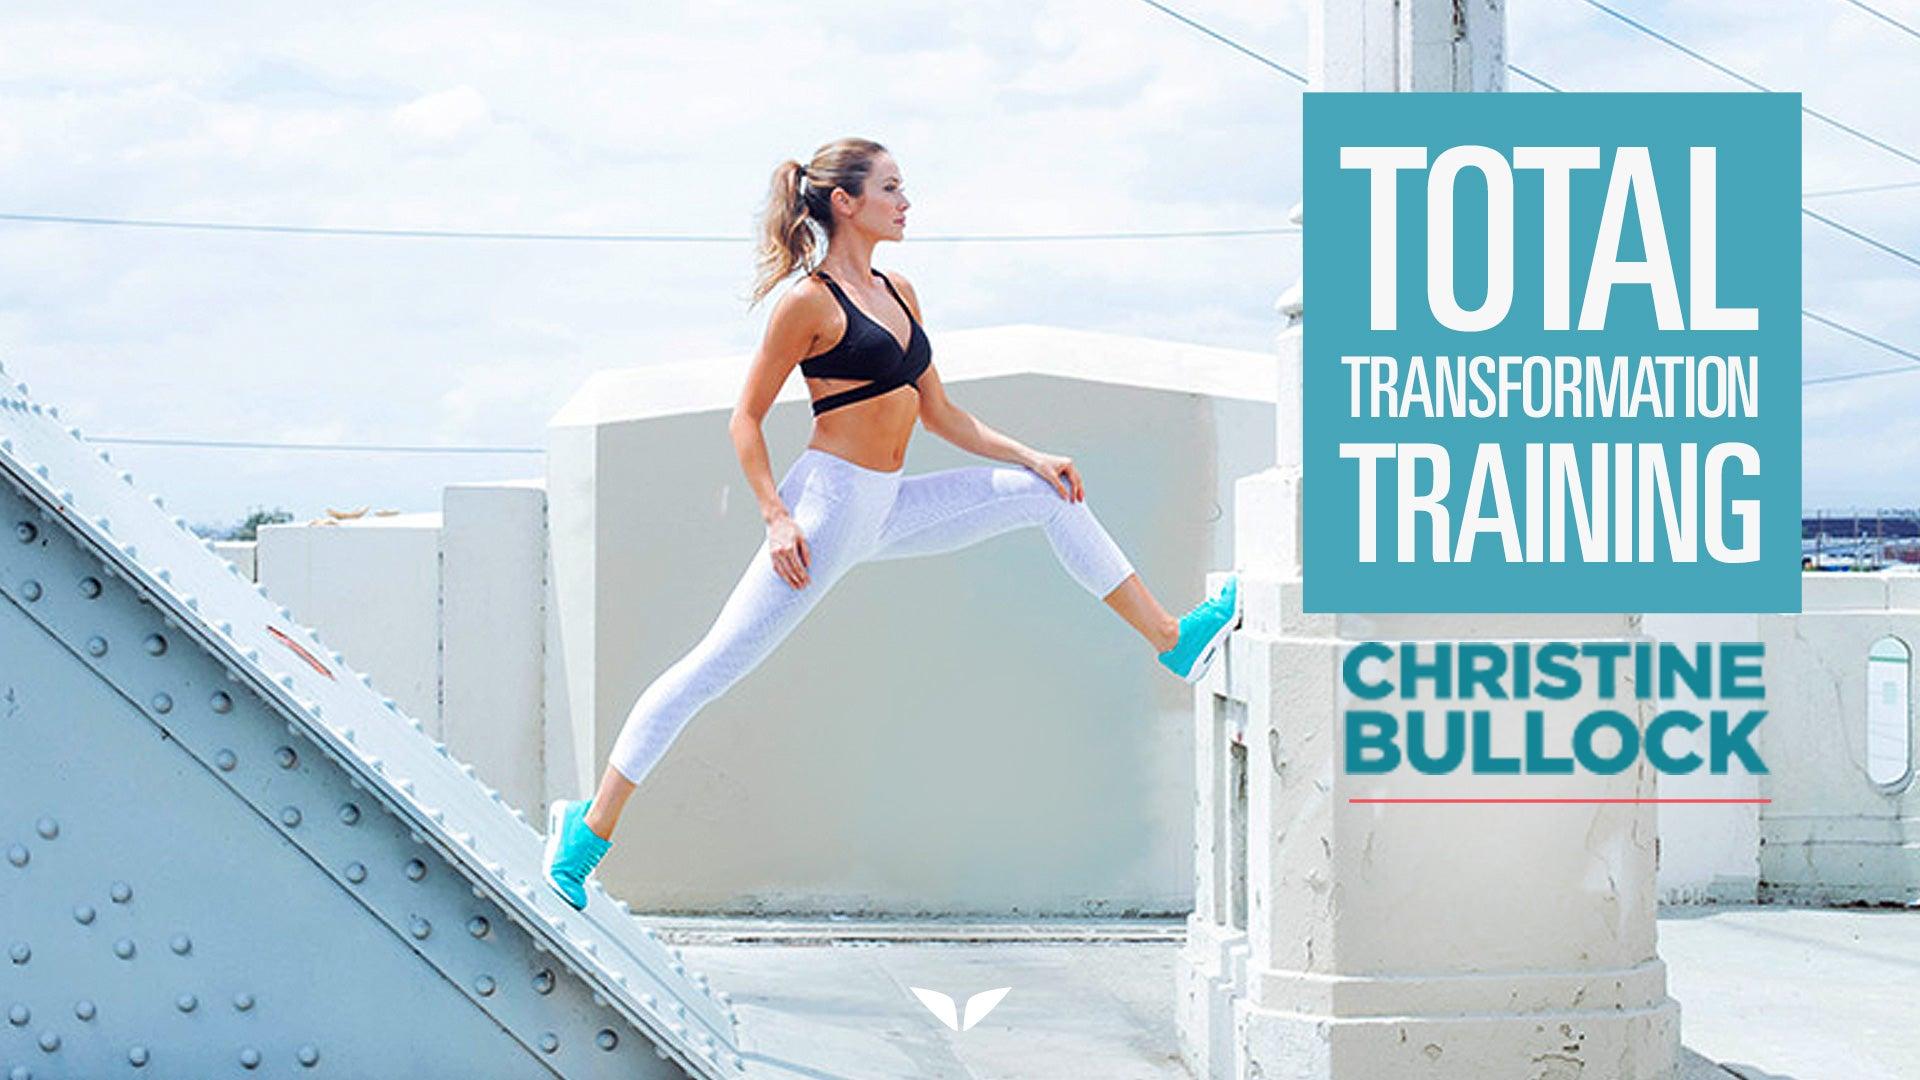 Total Transformation Training